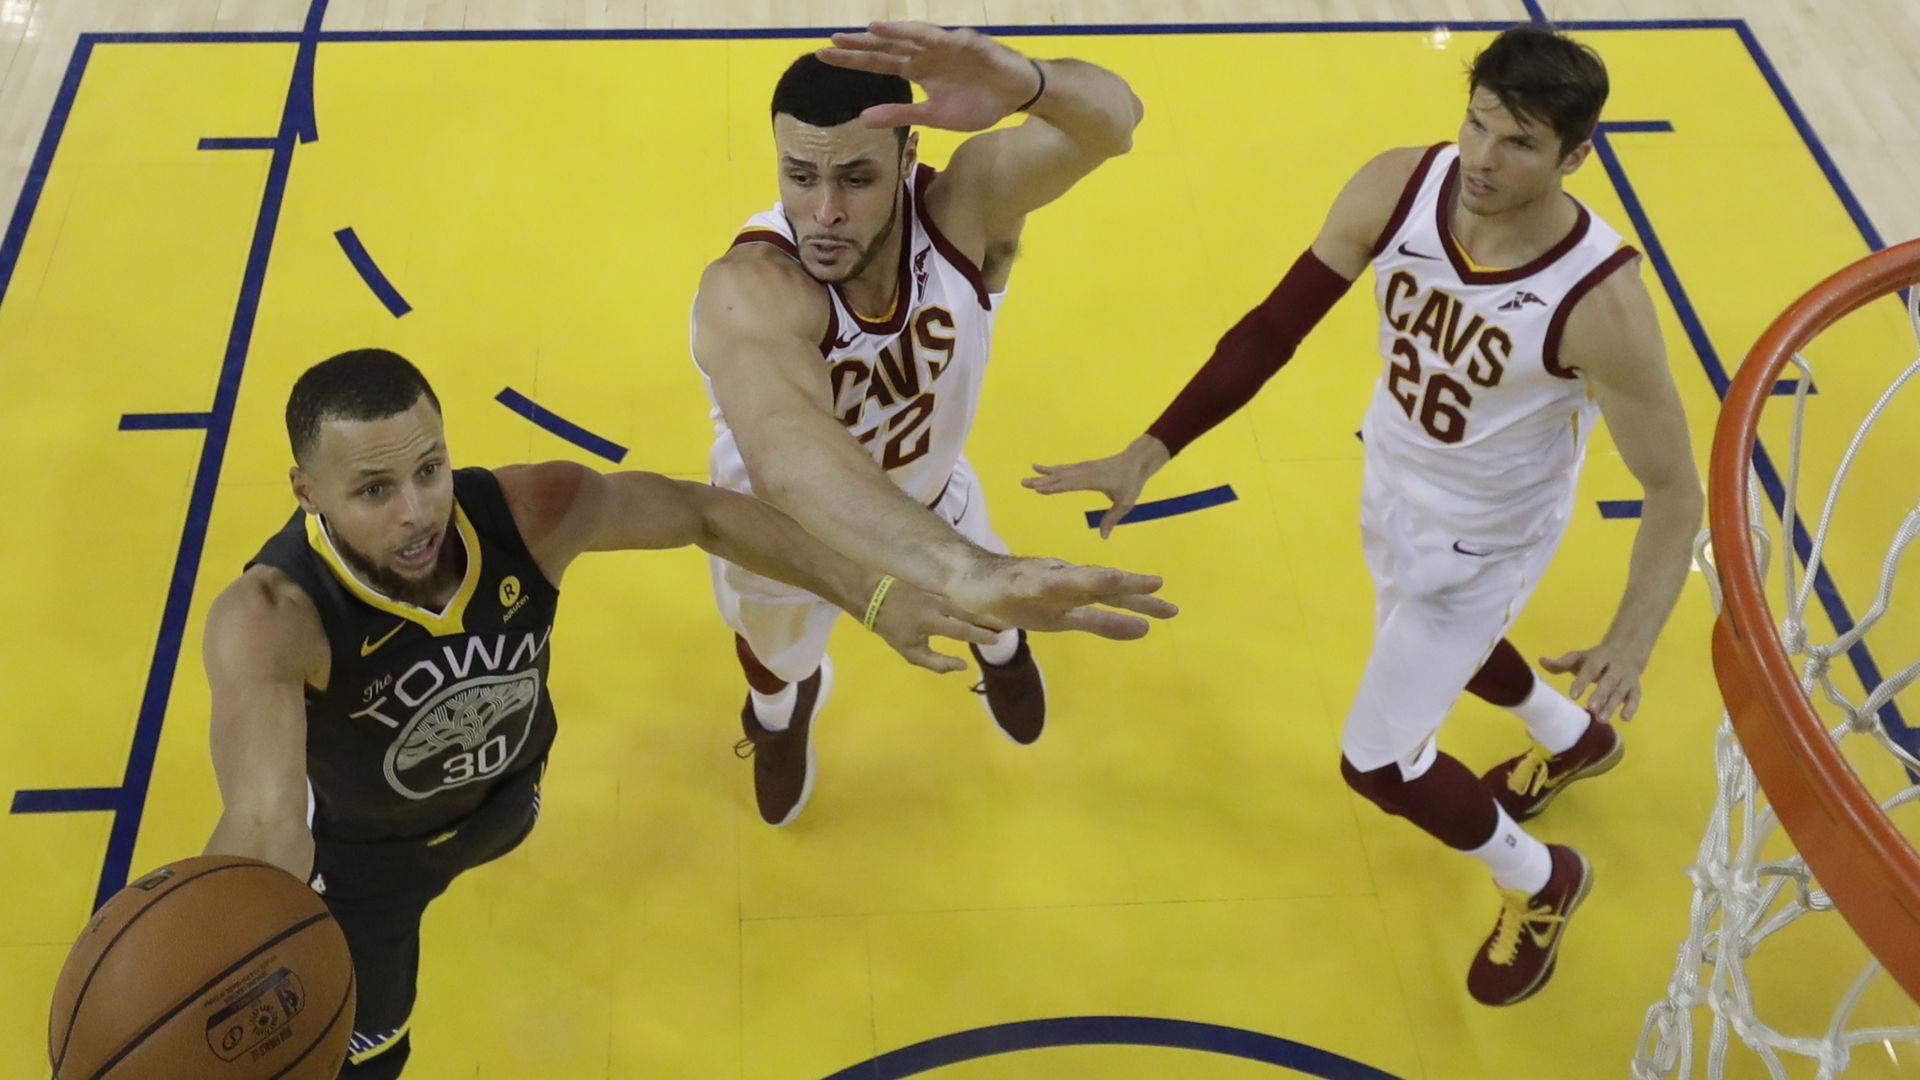 NBA Golden State poveo 2-0 uz rekord Currya u tricama